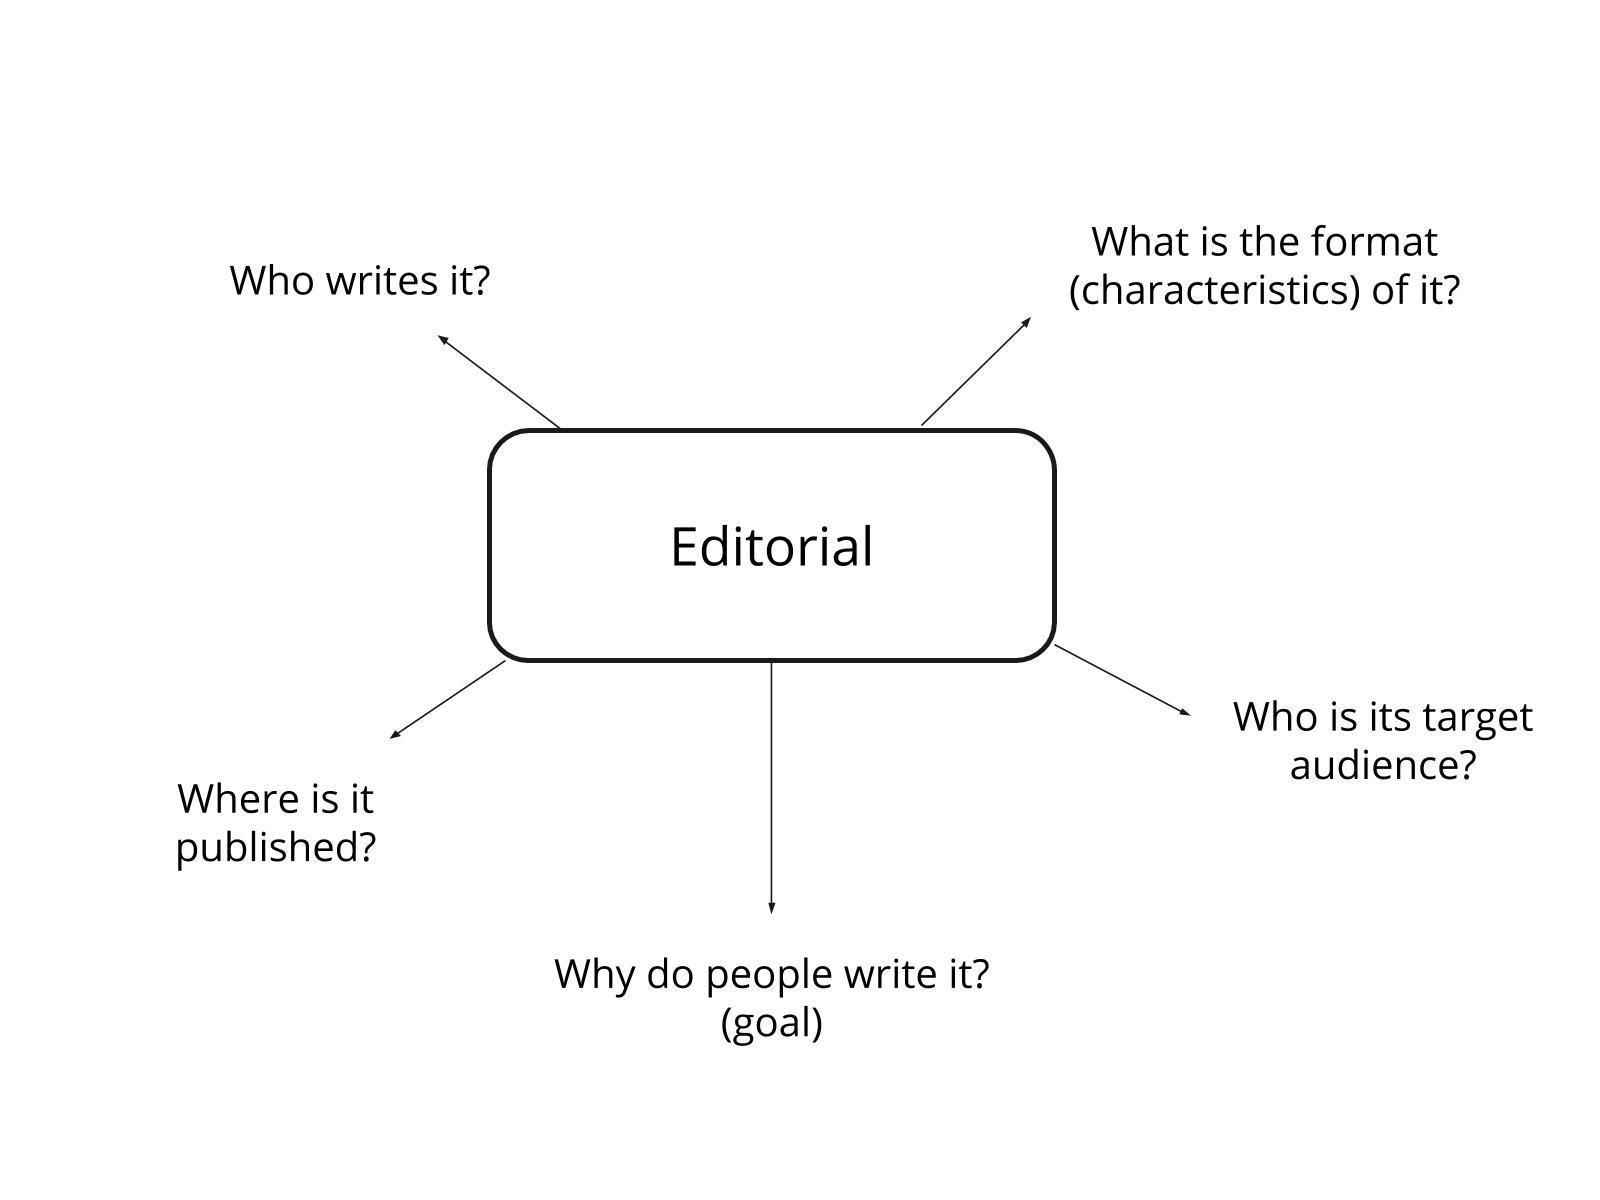 Editorial - Diferenciar fatos e opiniões